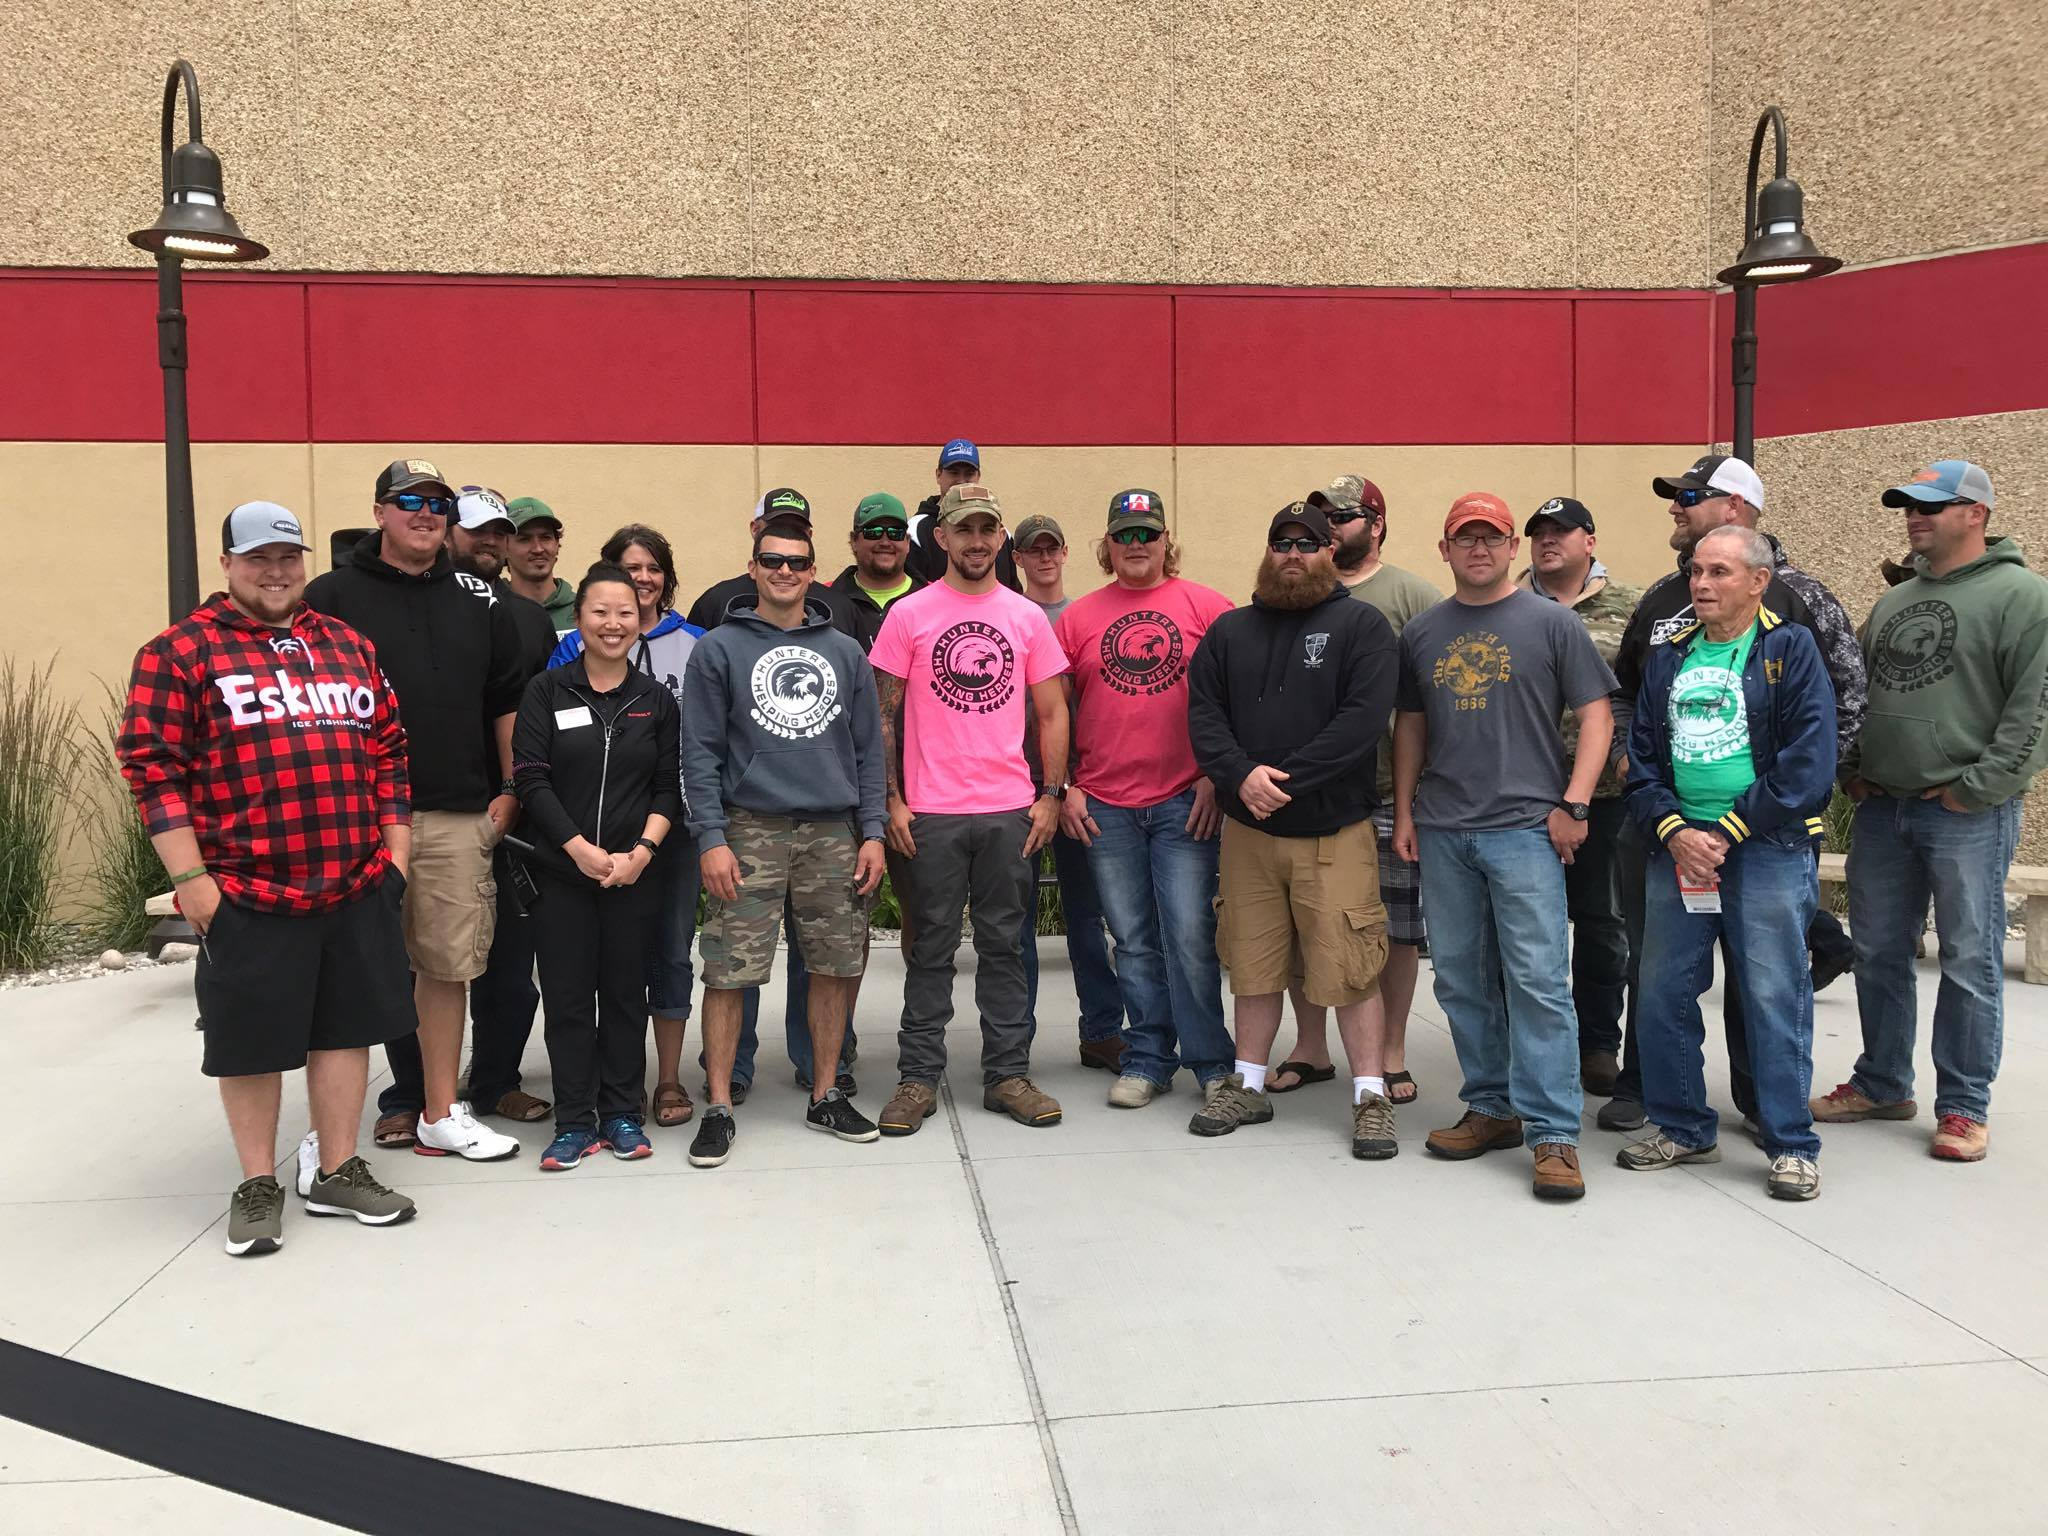 Shane Kruchten, wounded Veterans, Hunters Helping Heroes